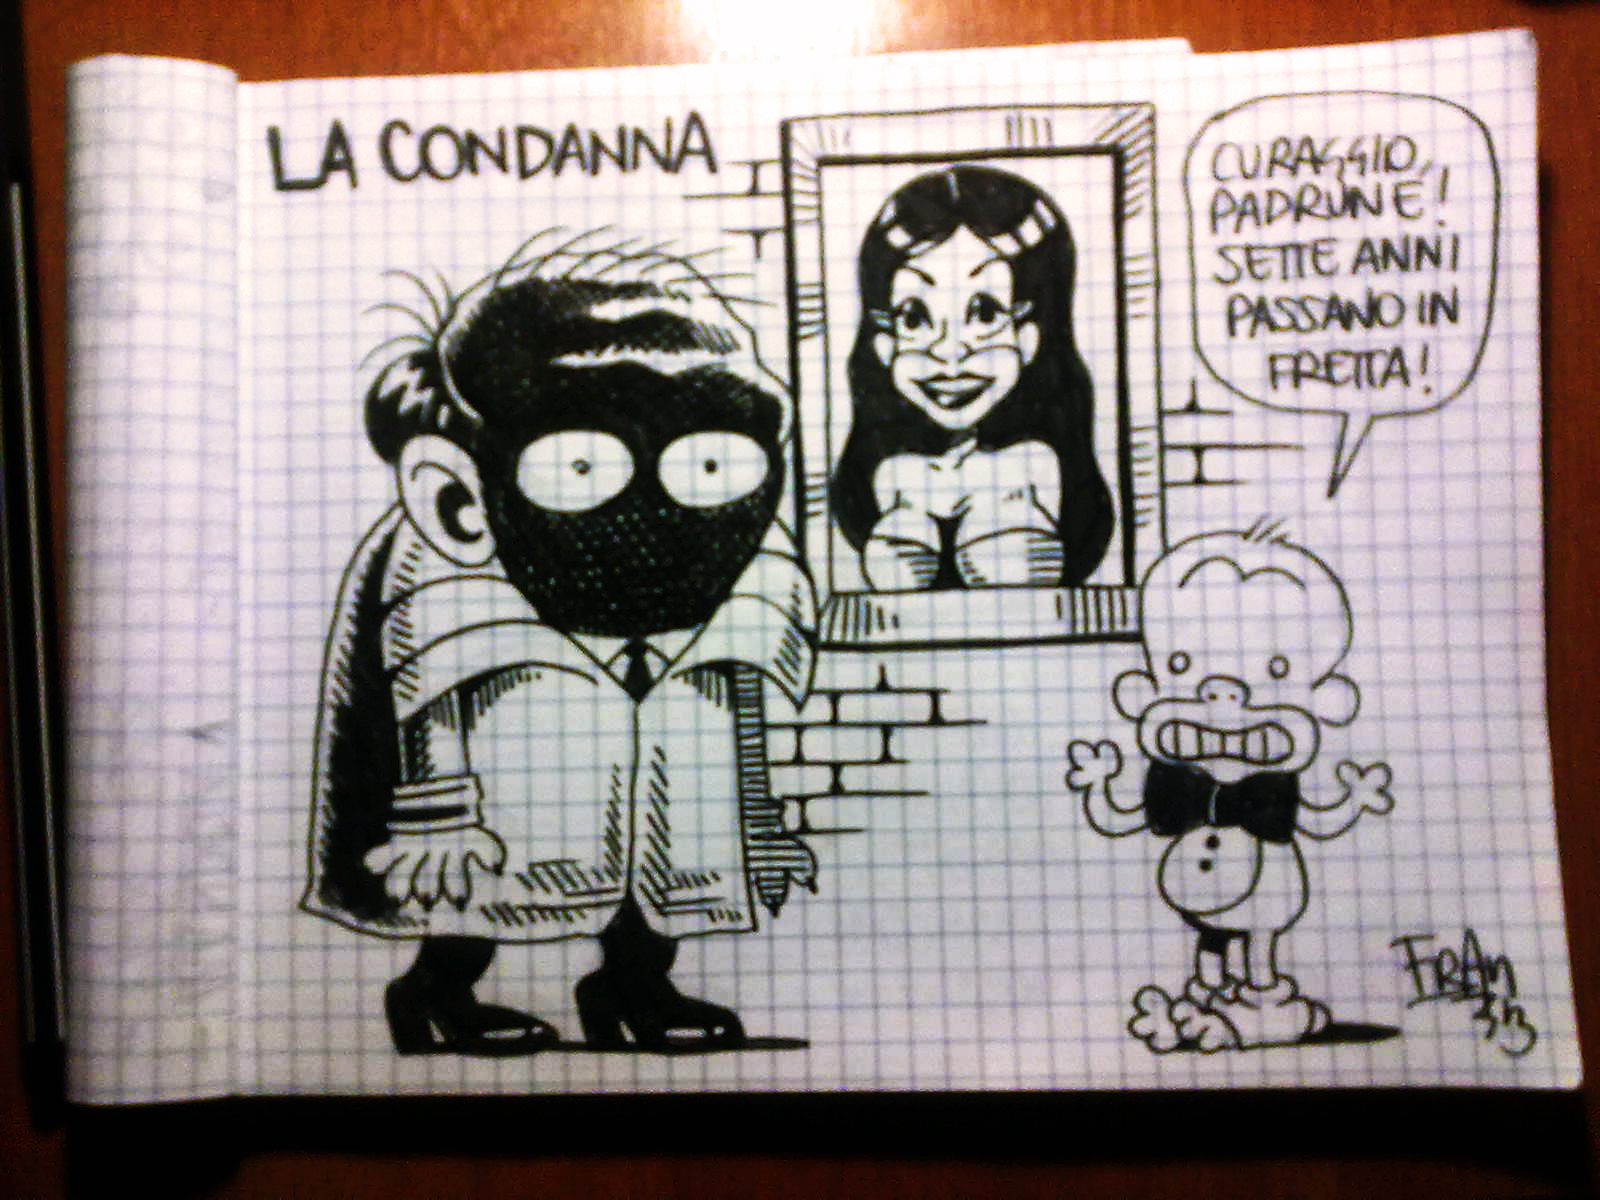 LaCondanna - giu 2013